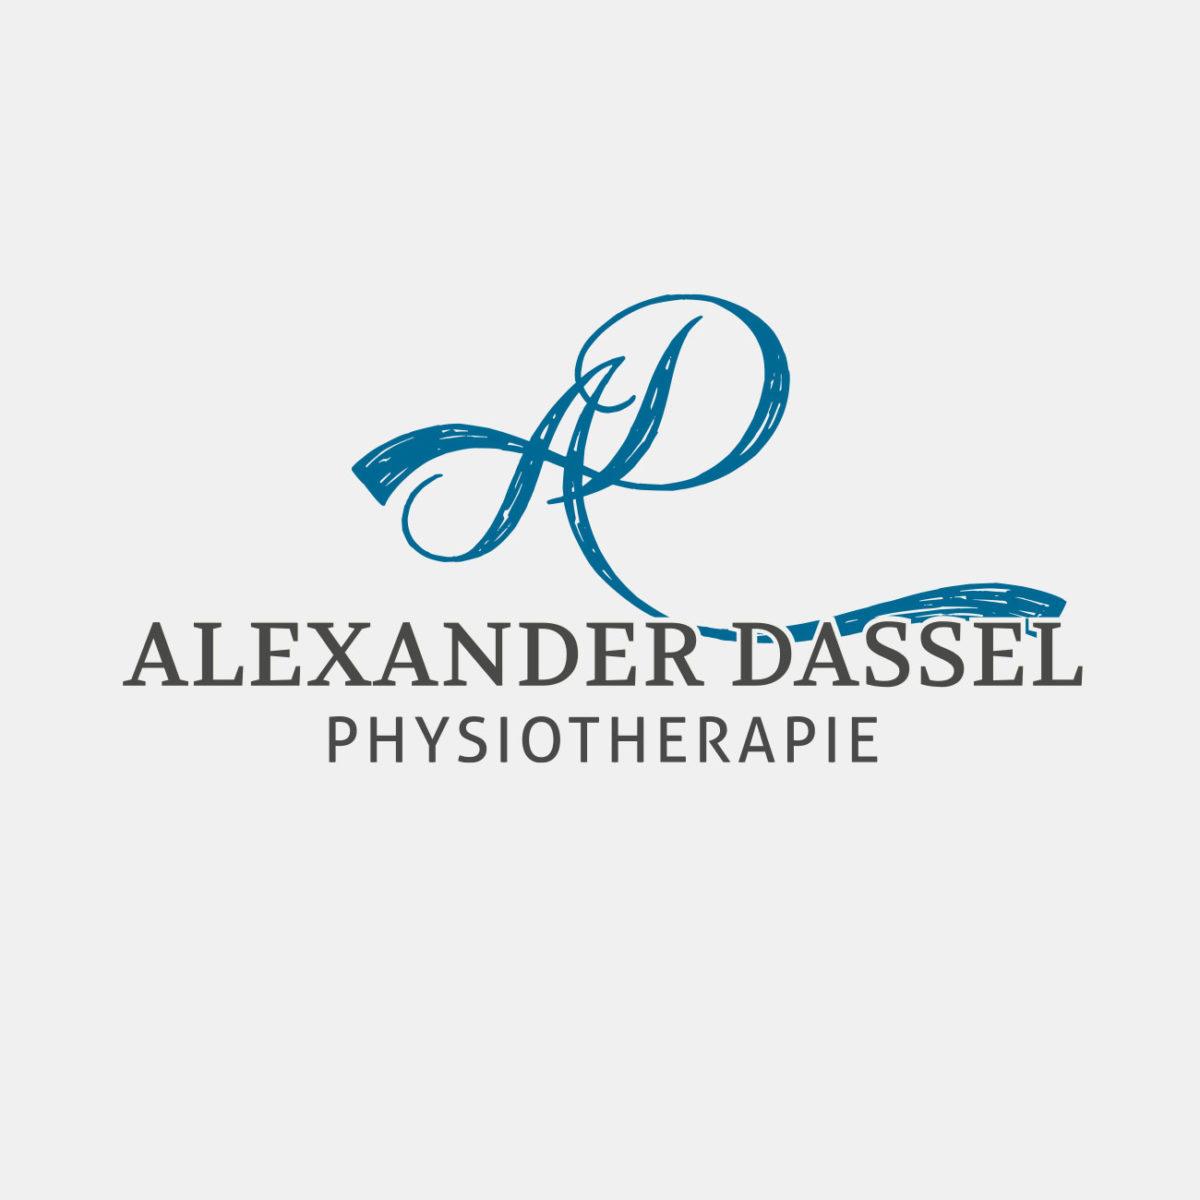 Alexander Dassel Logodesign